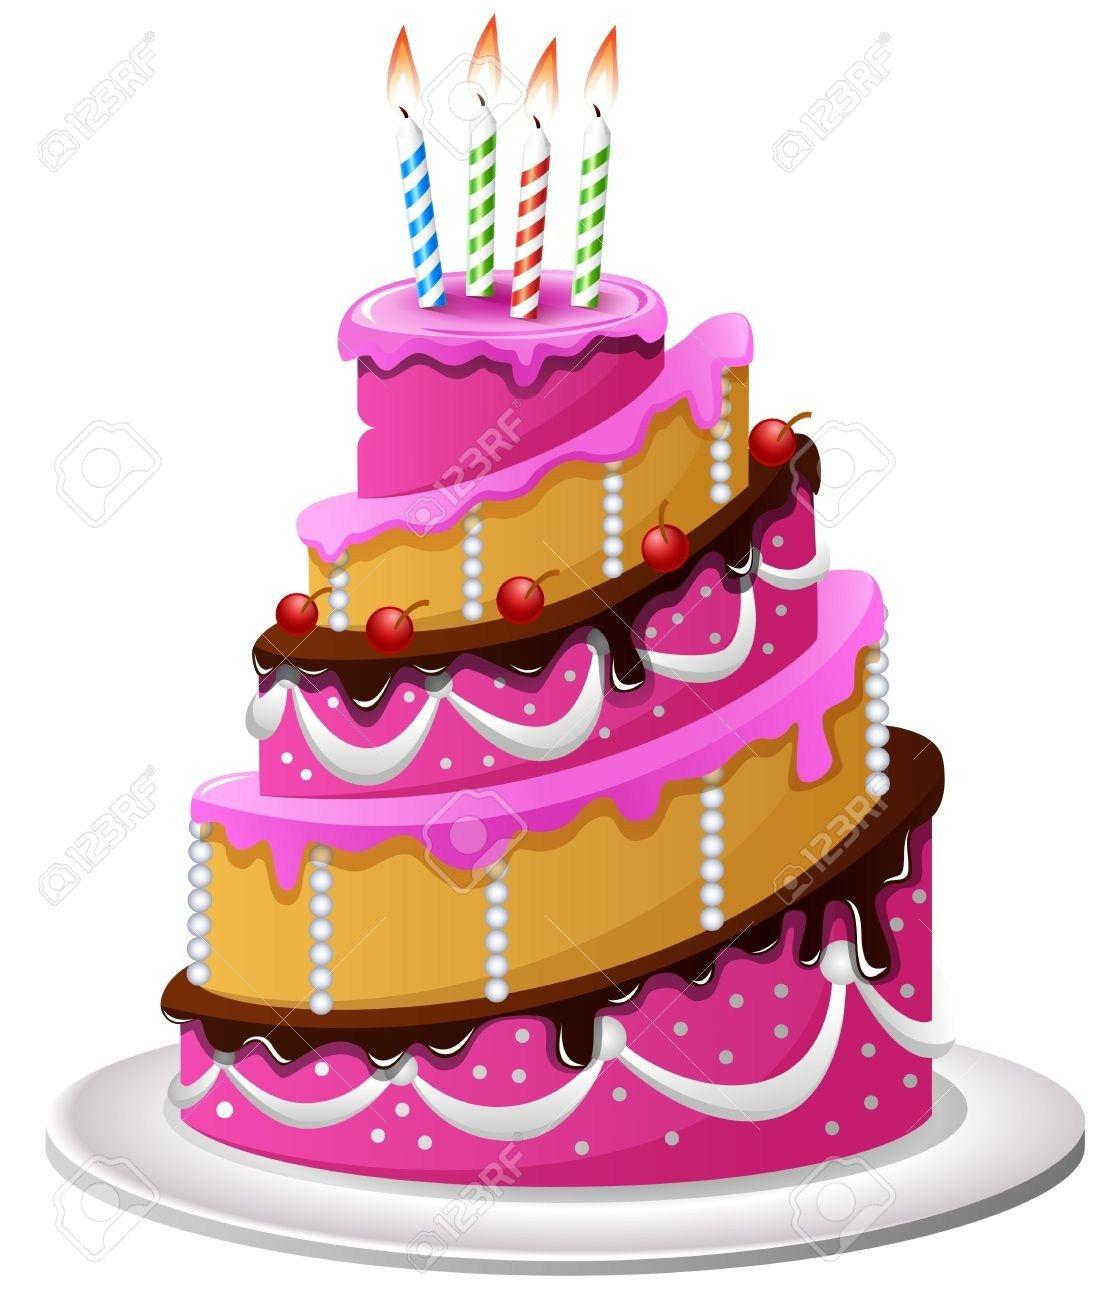 20+ Creative Picture of Birthday Cake Cartoon . Birthday